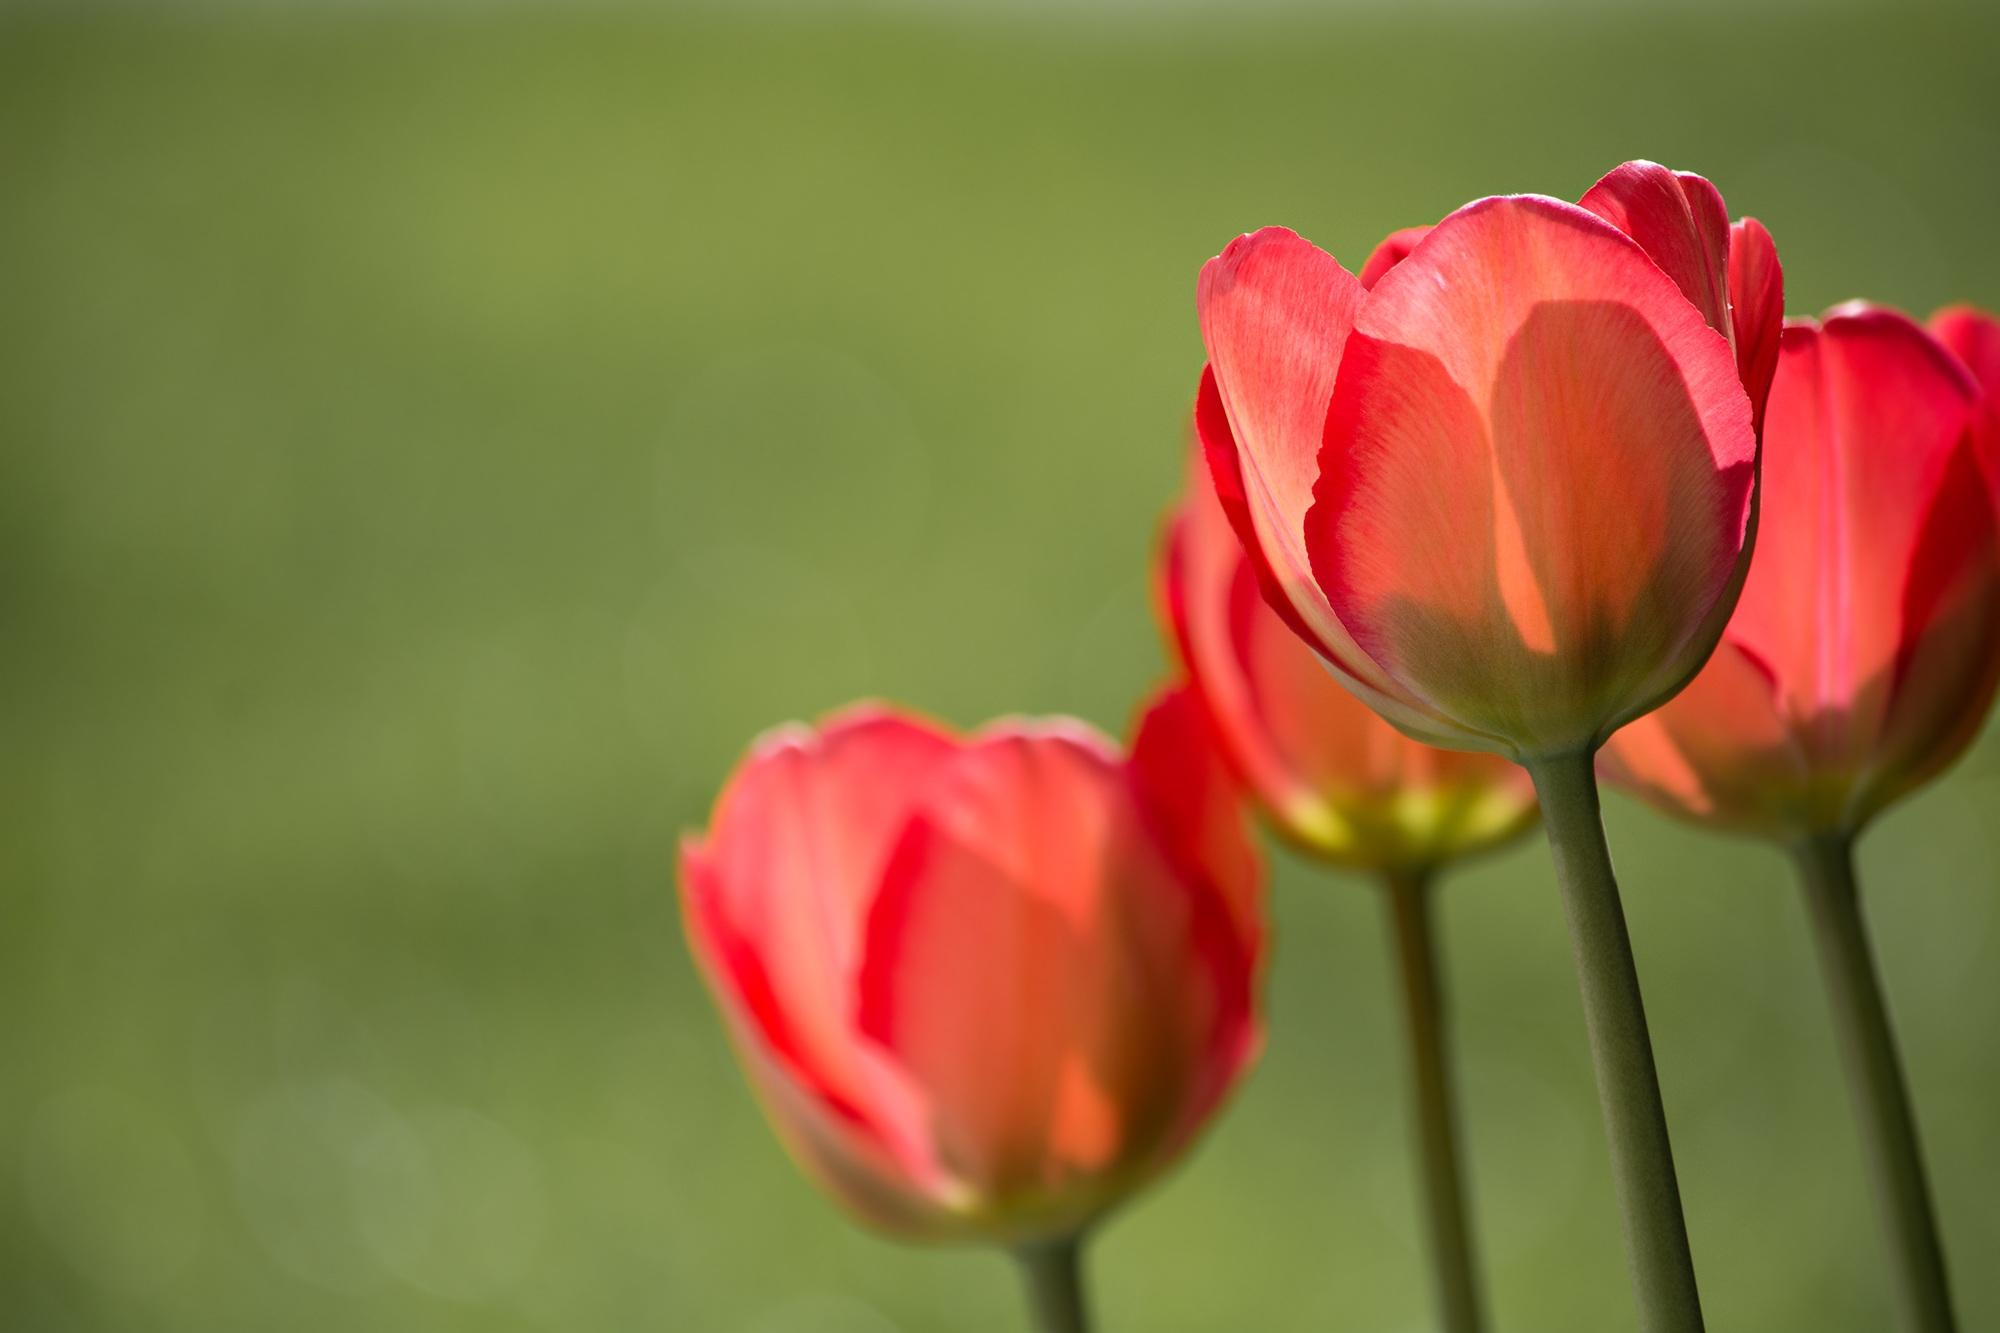 Free images nature sunlight petal tulip close flower garden nature plant sunlight flower petal tulip red garden close flowers tulips flower garden spring flower macro mightylinksfo